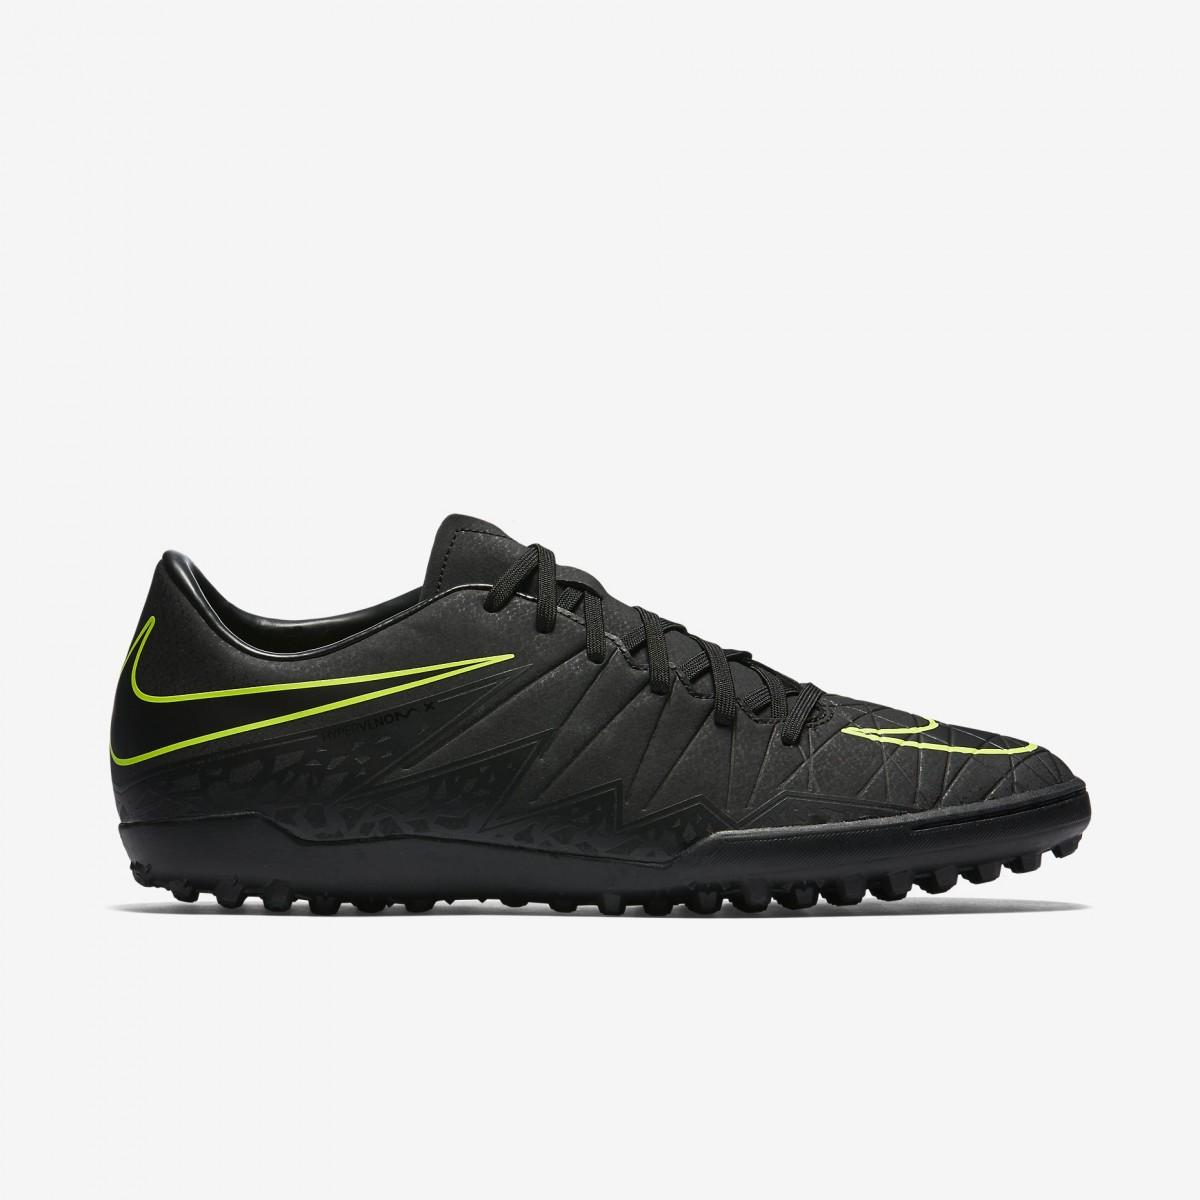 dd3e5b2a7a81e Bizz Store - Chuteira Society Nike Hypervenom Phelon Preta